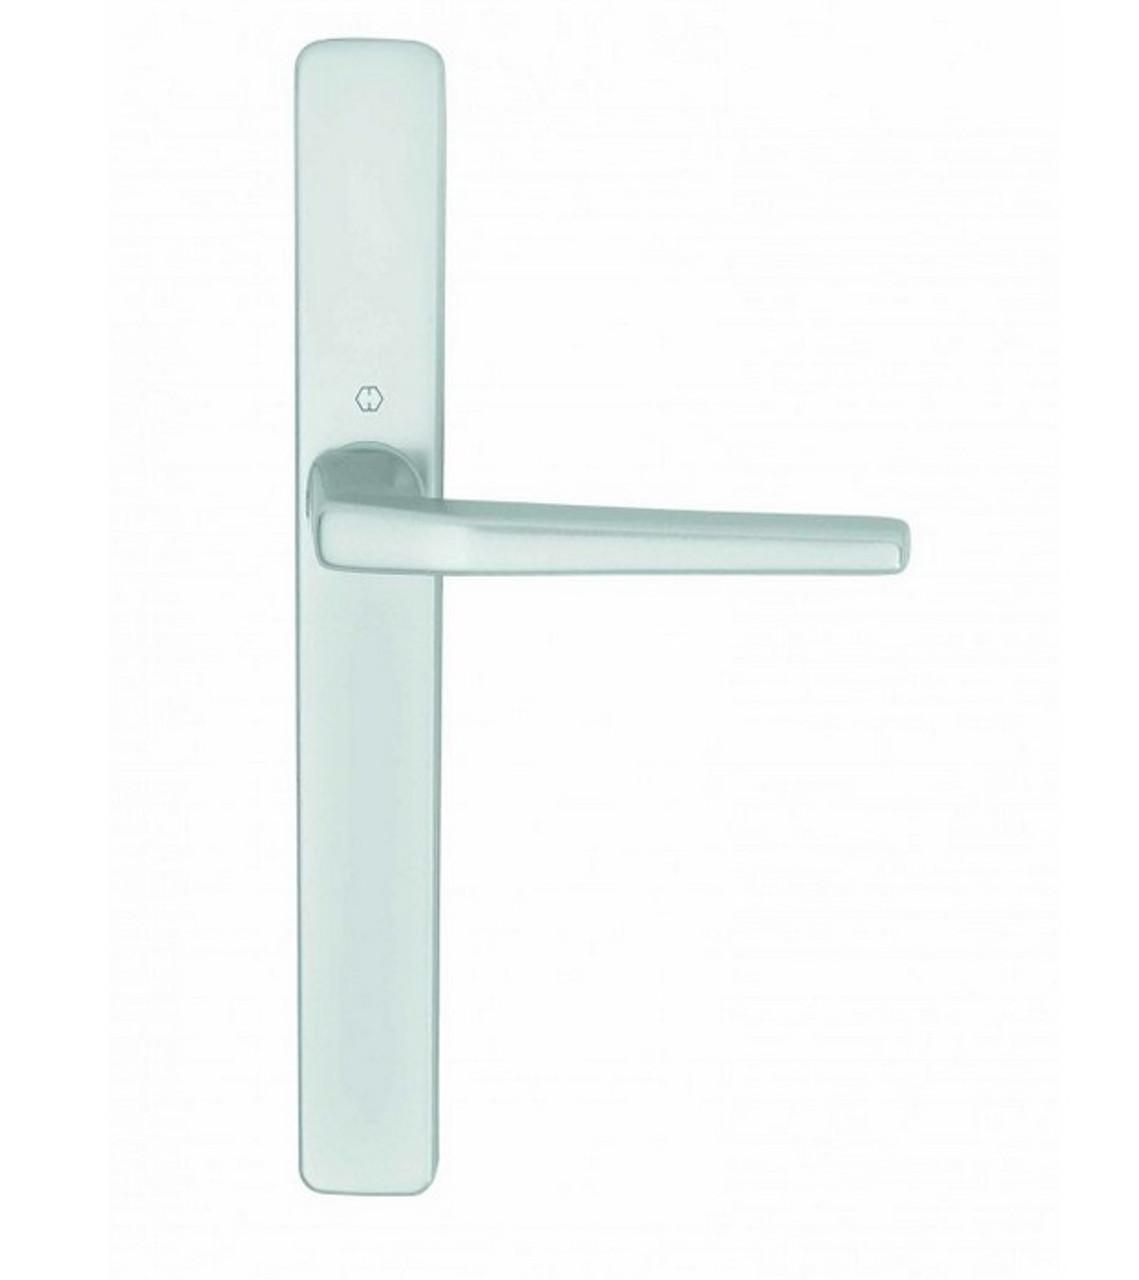 Frankfurt Aluminum 117/2246 (in-active handle)